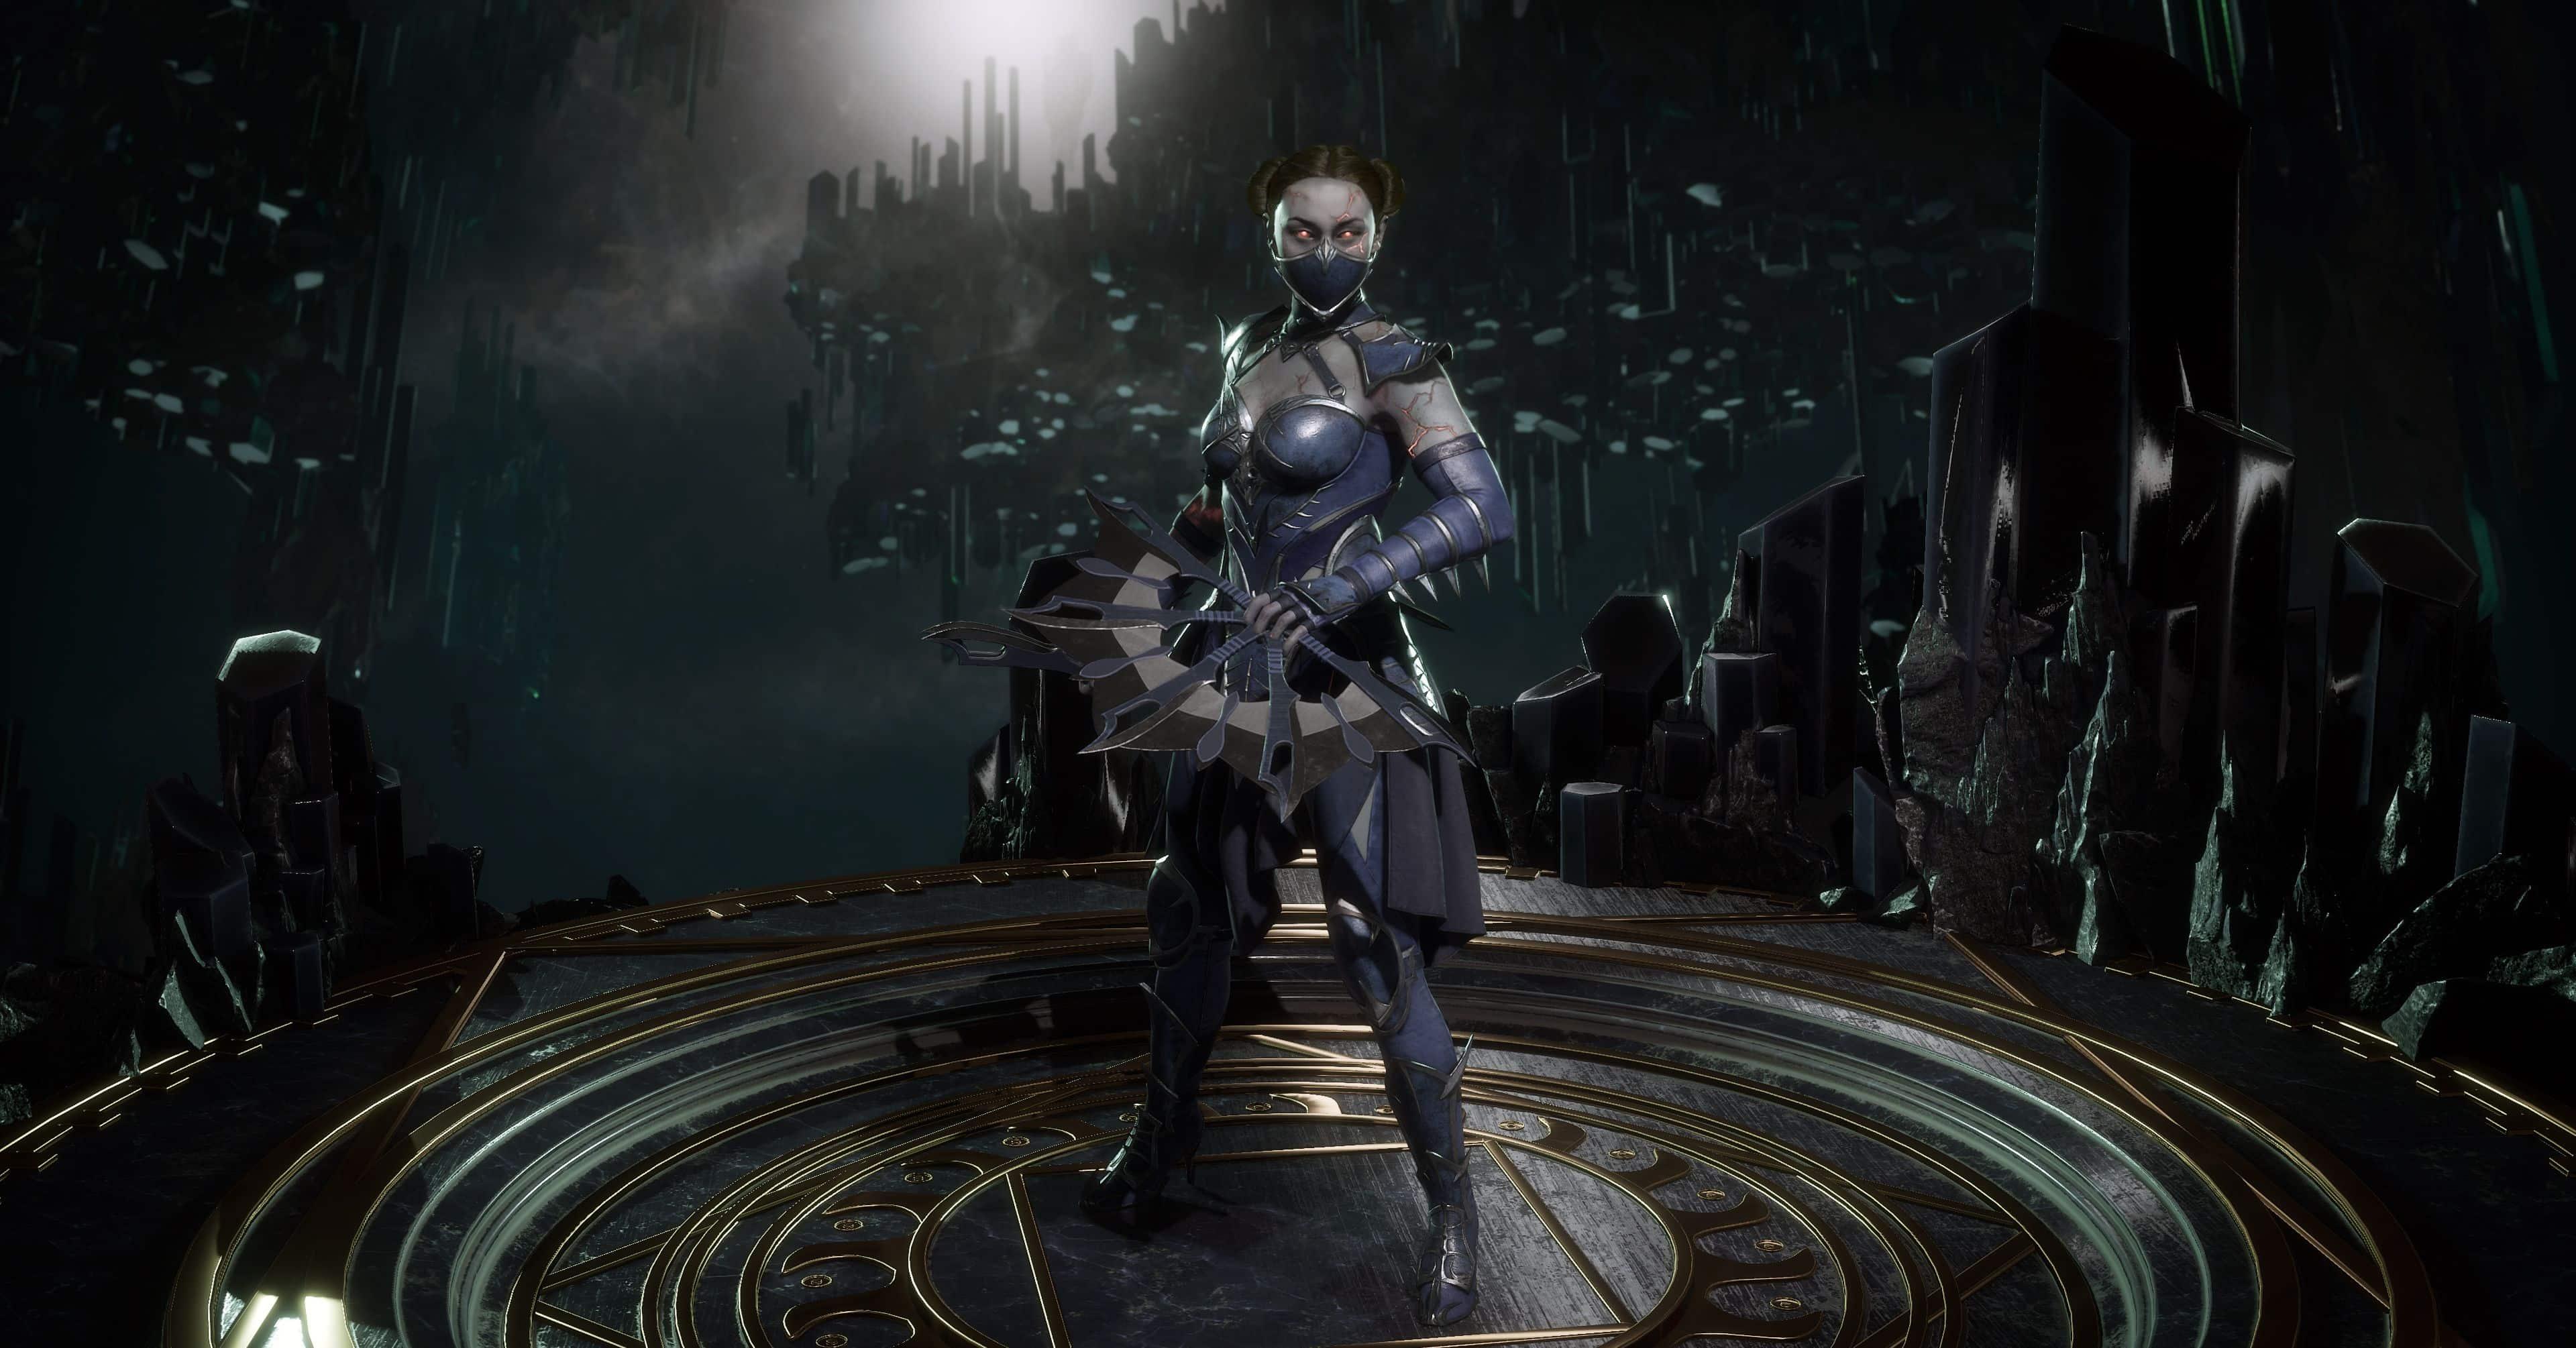 Mortal Kombat 11 - Kitana - Move List, Combos, Fatalities